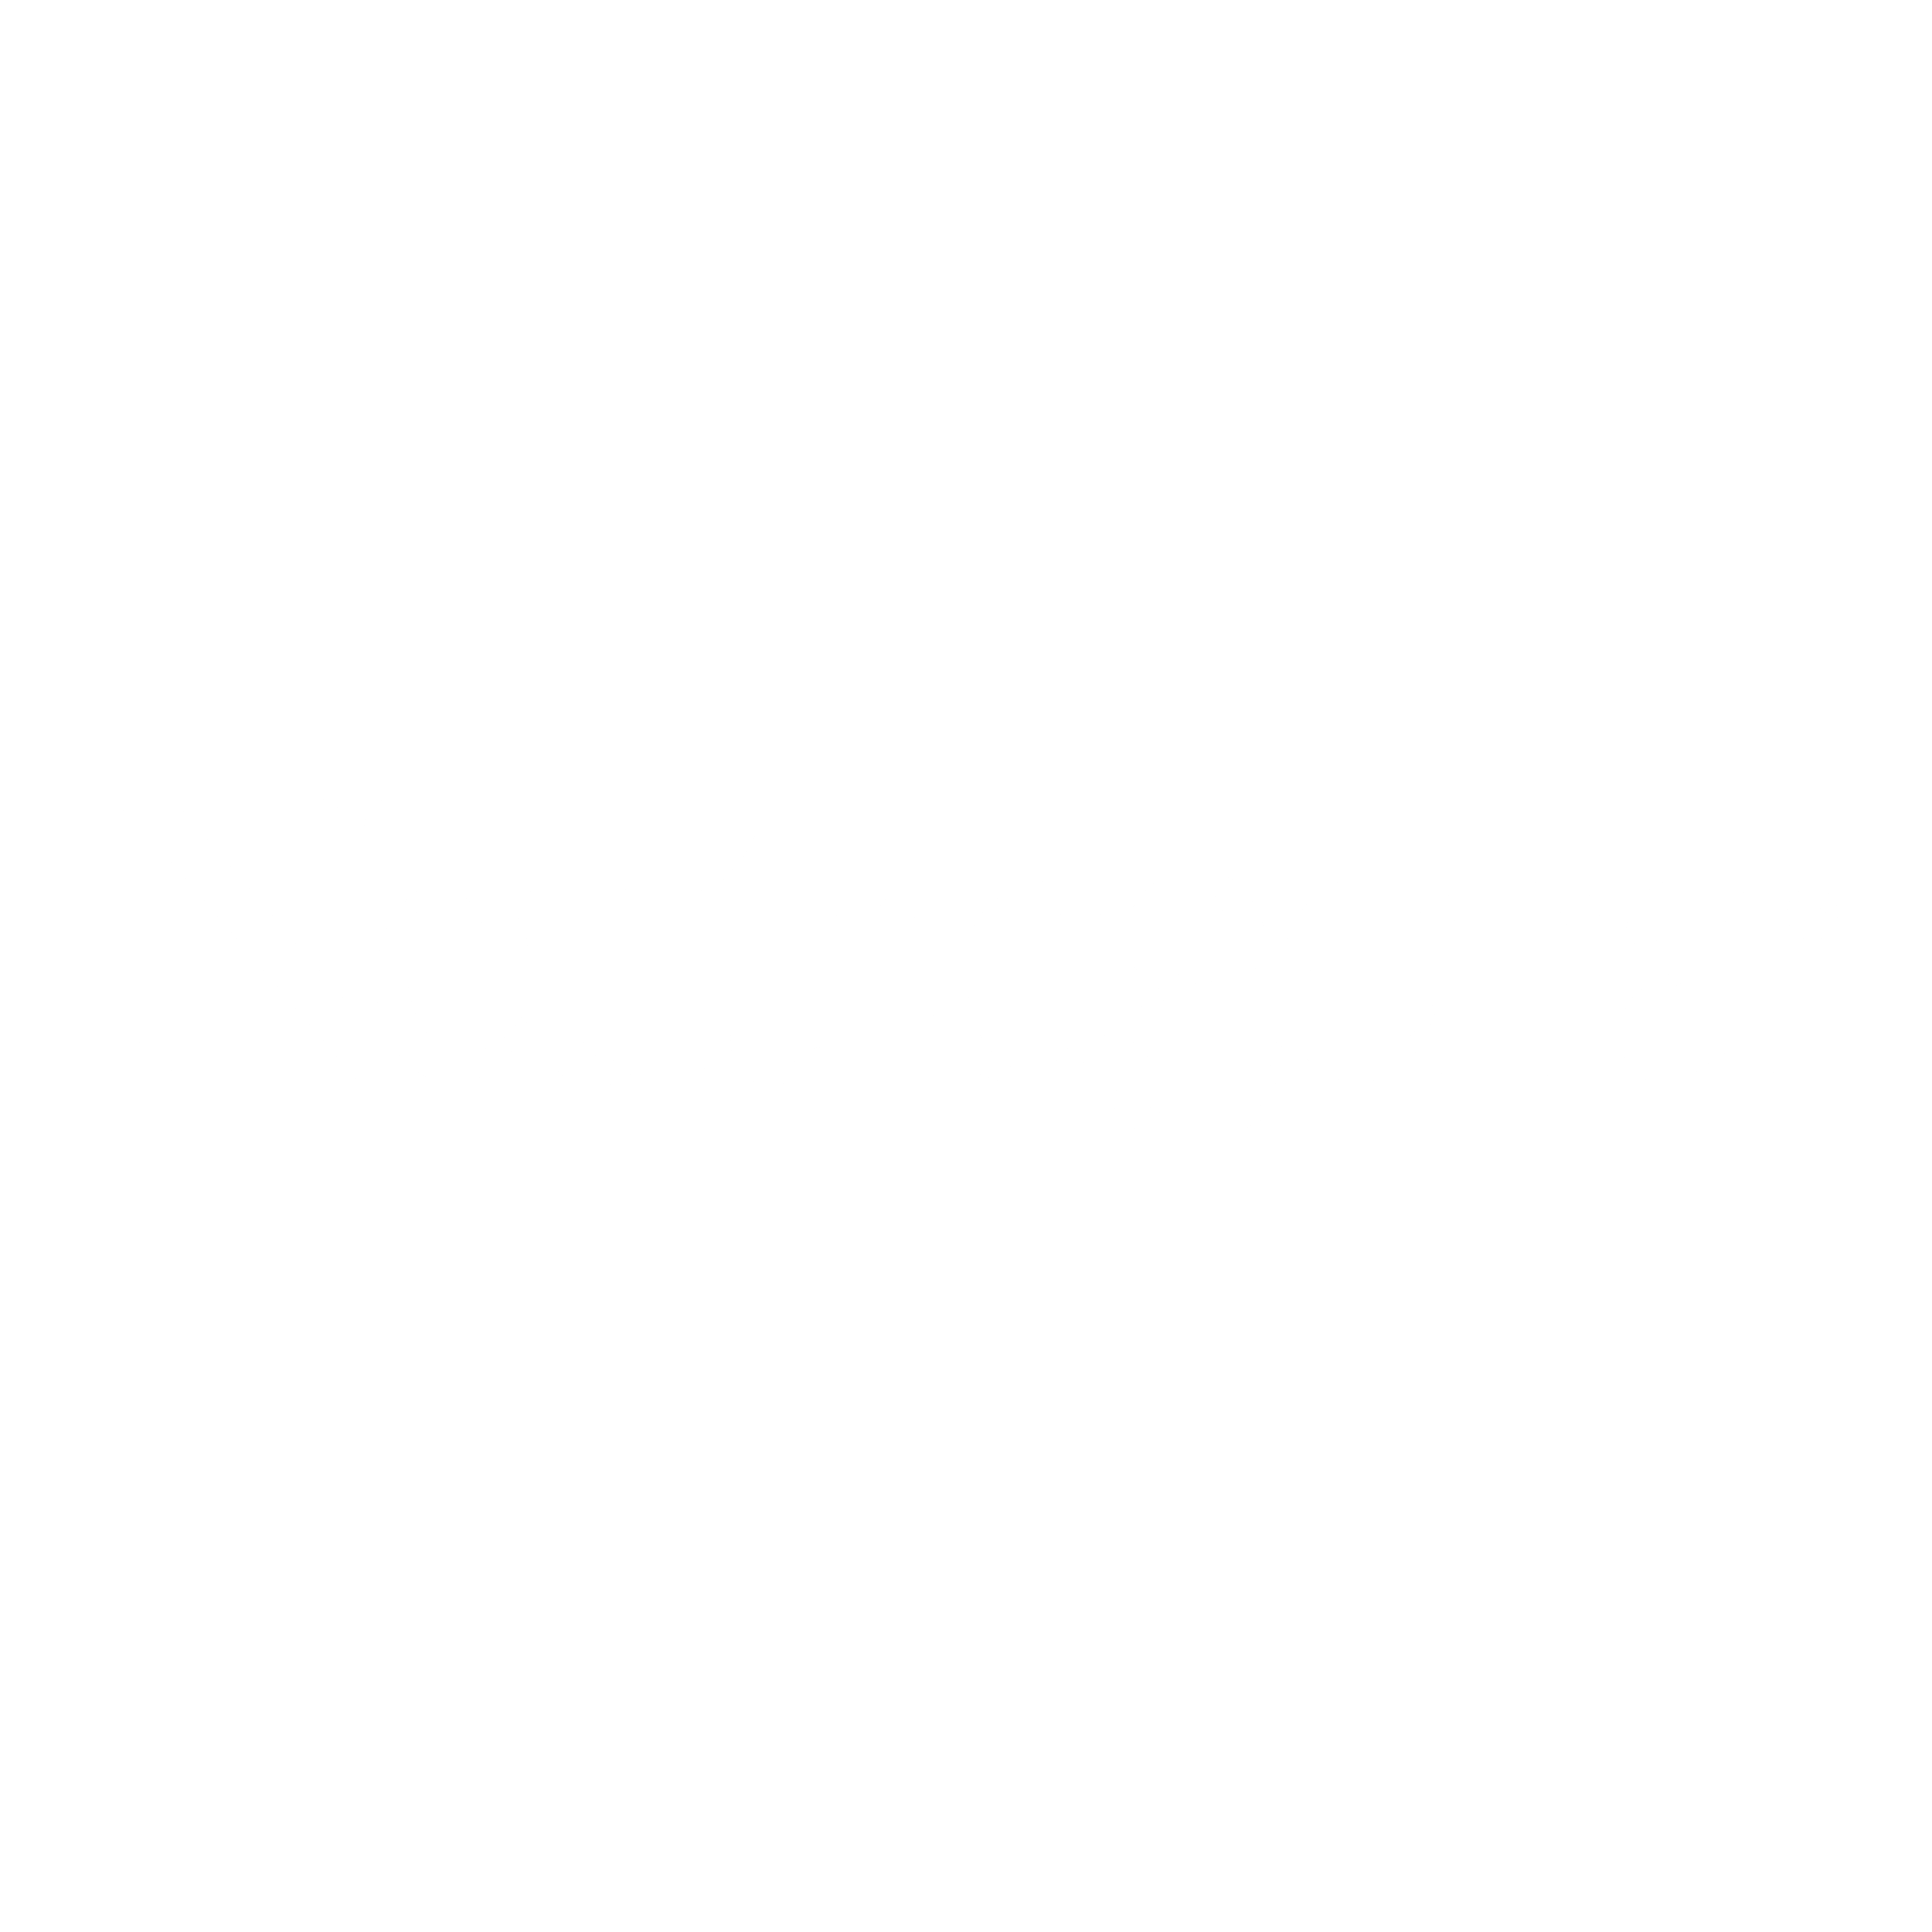 Neutrogena Logo PNG Transparent & SVG Vector - Freebie Supply